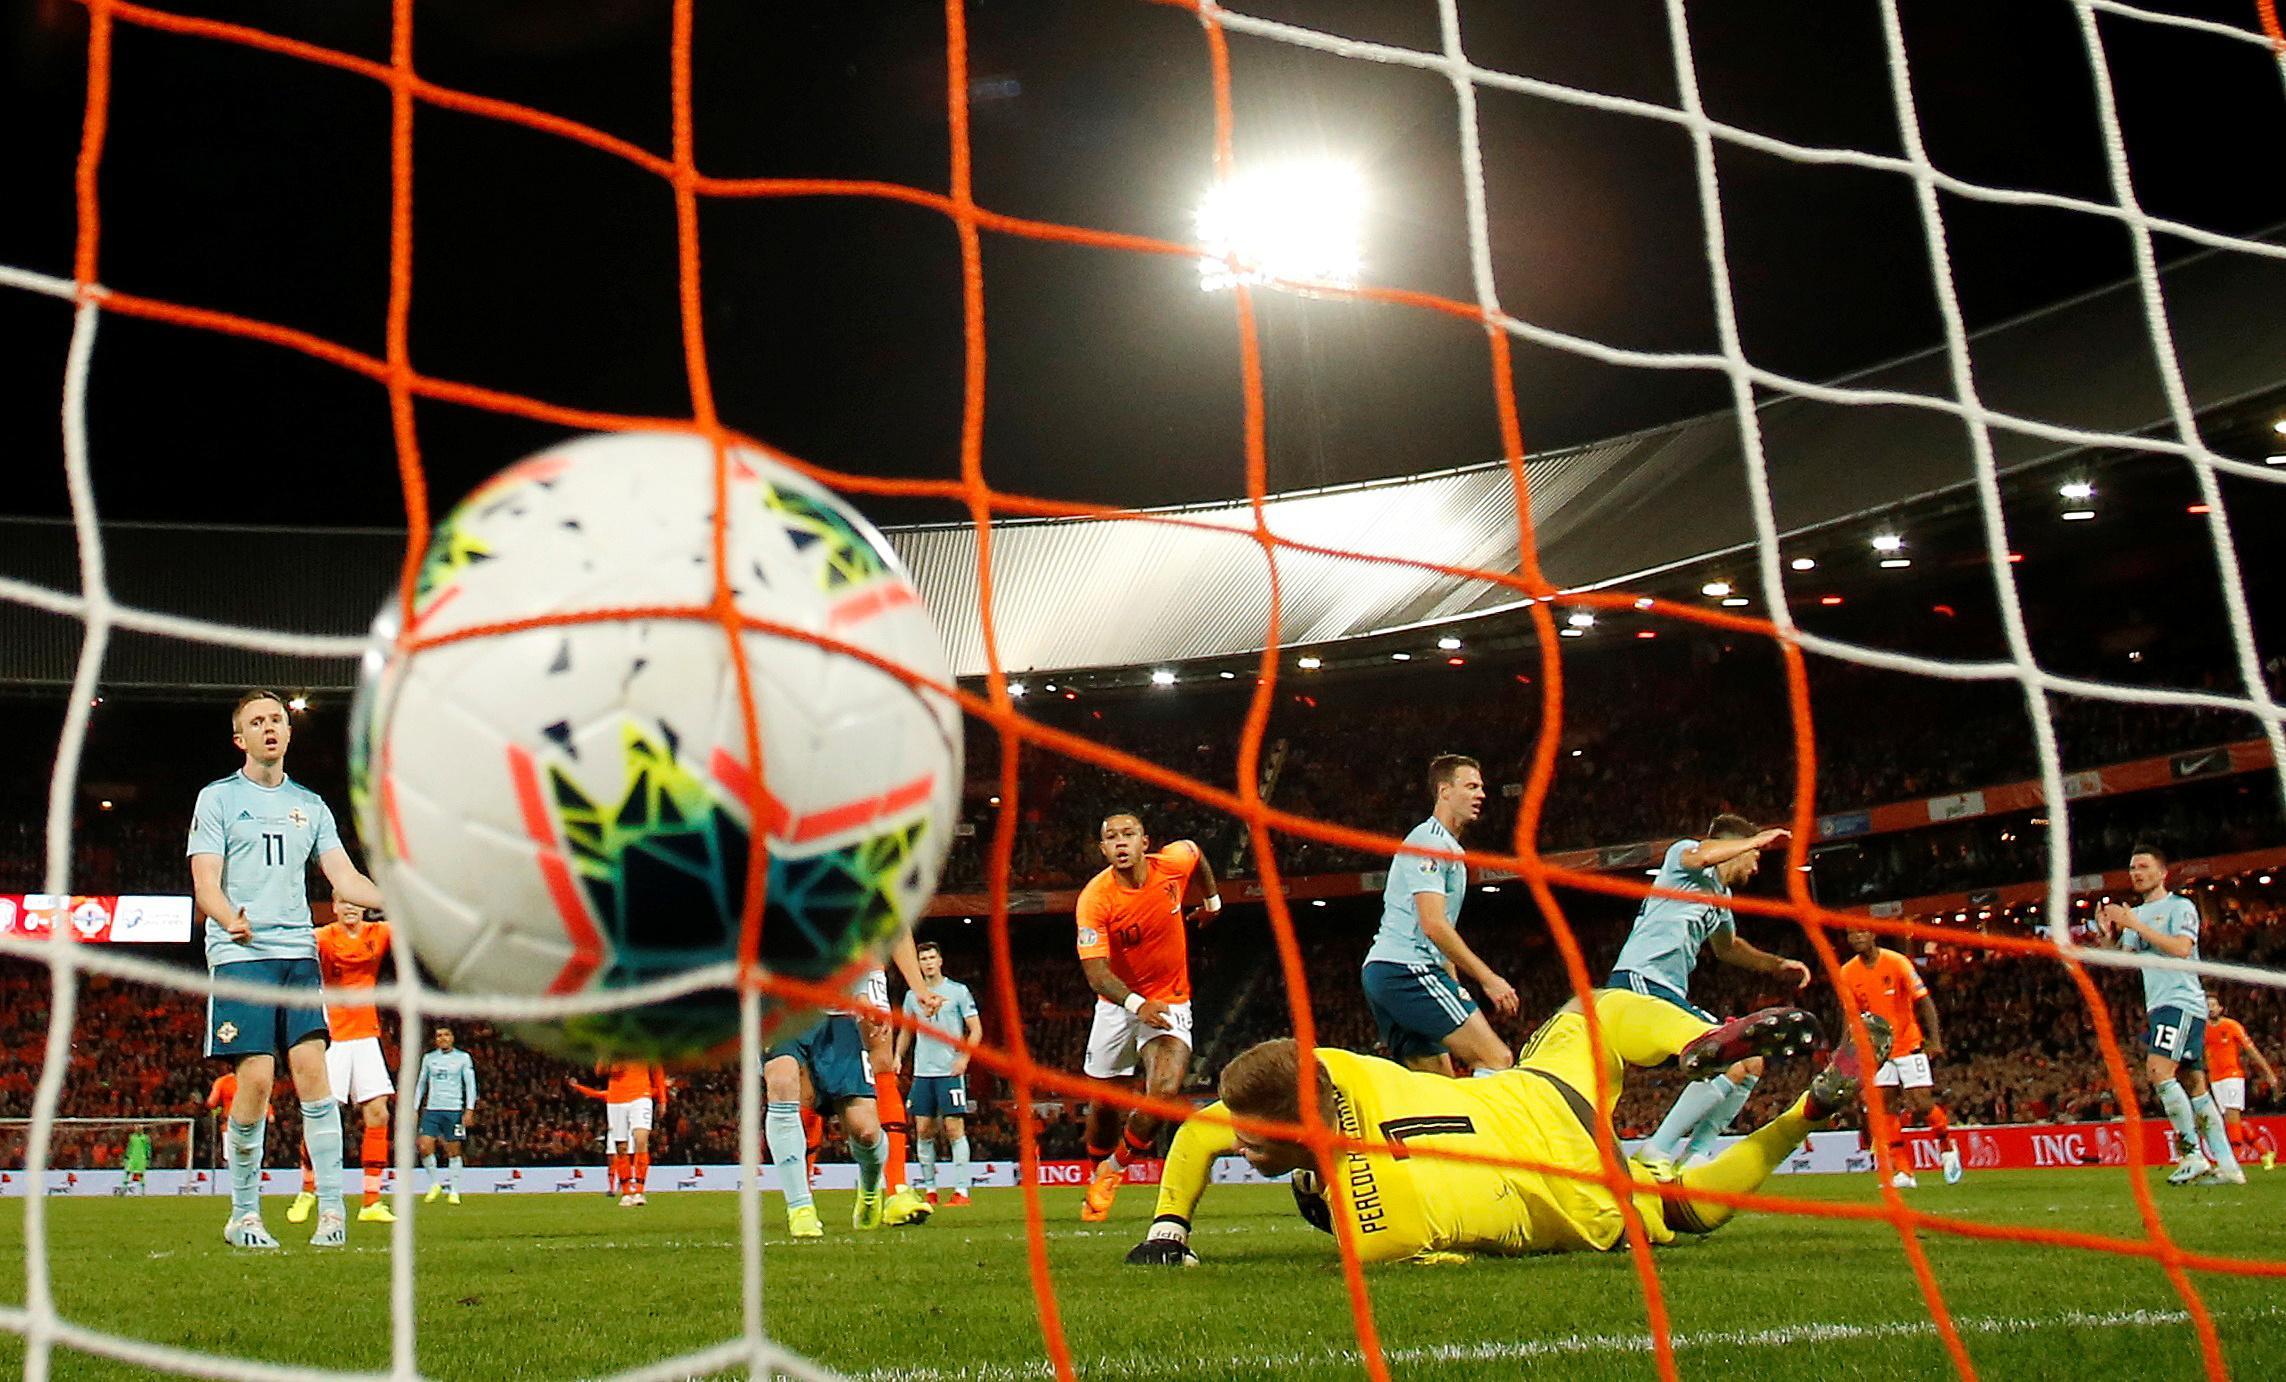 Dutch grab late goals to beat Northern Ireland 3-1